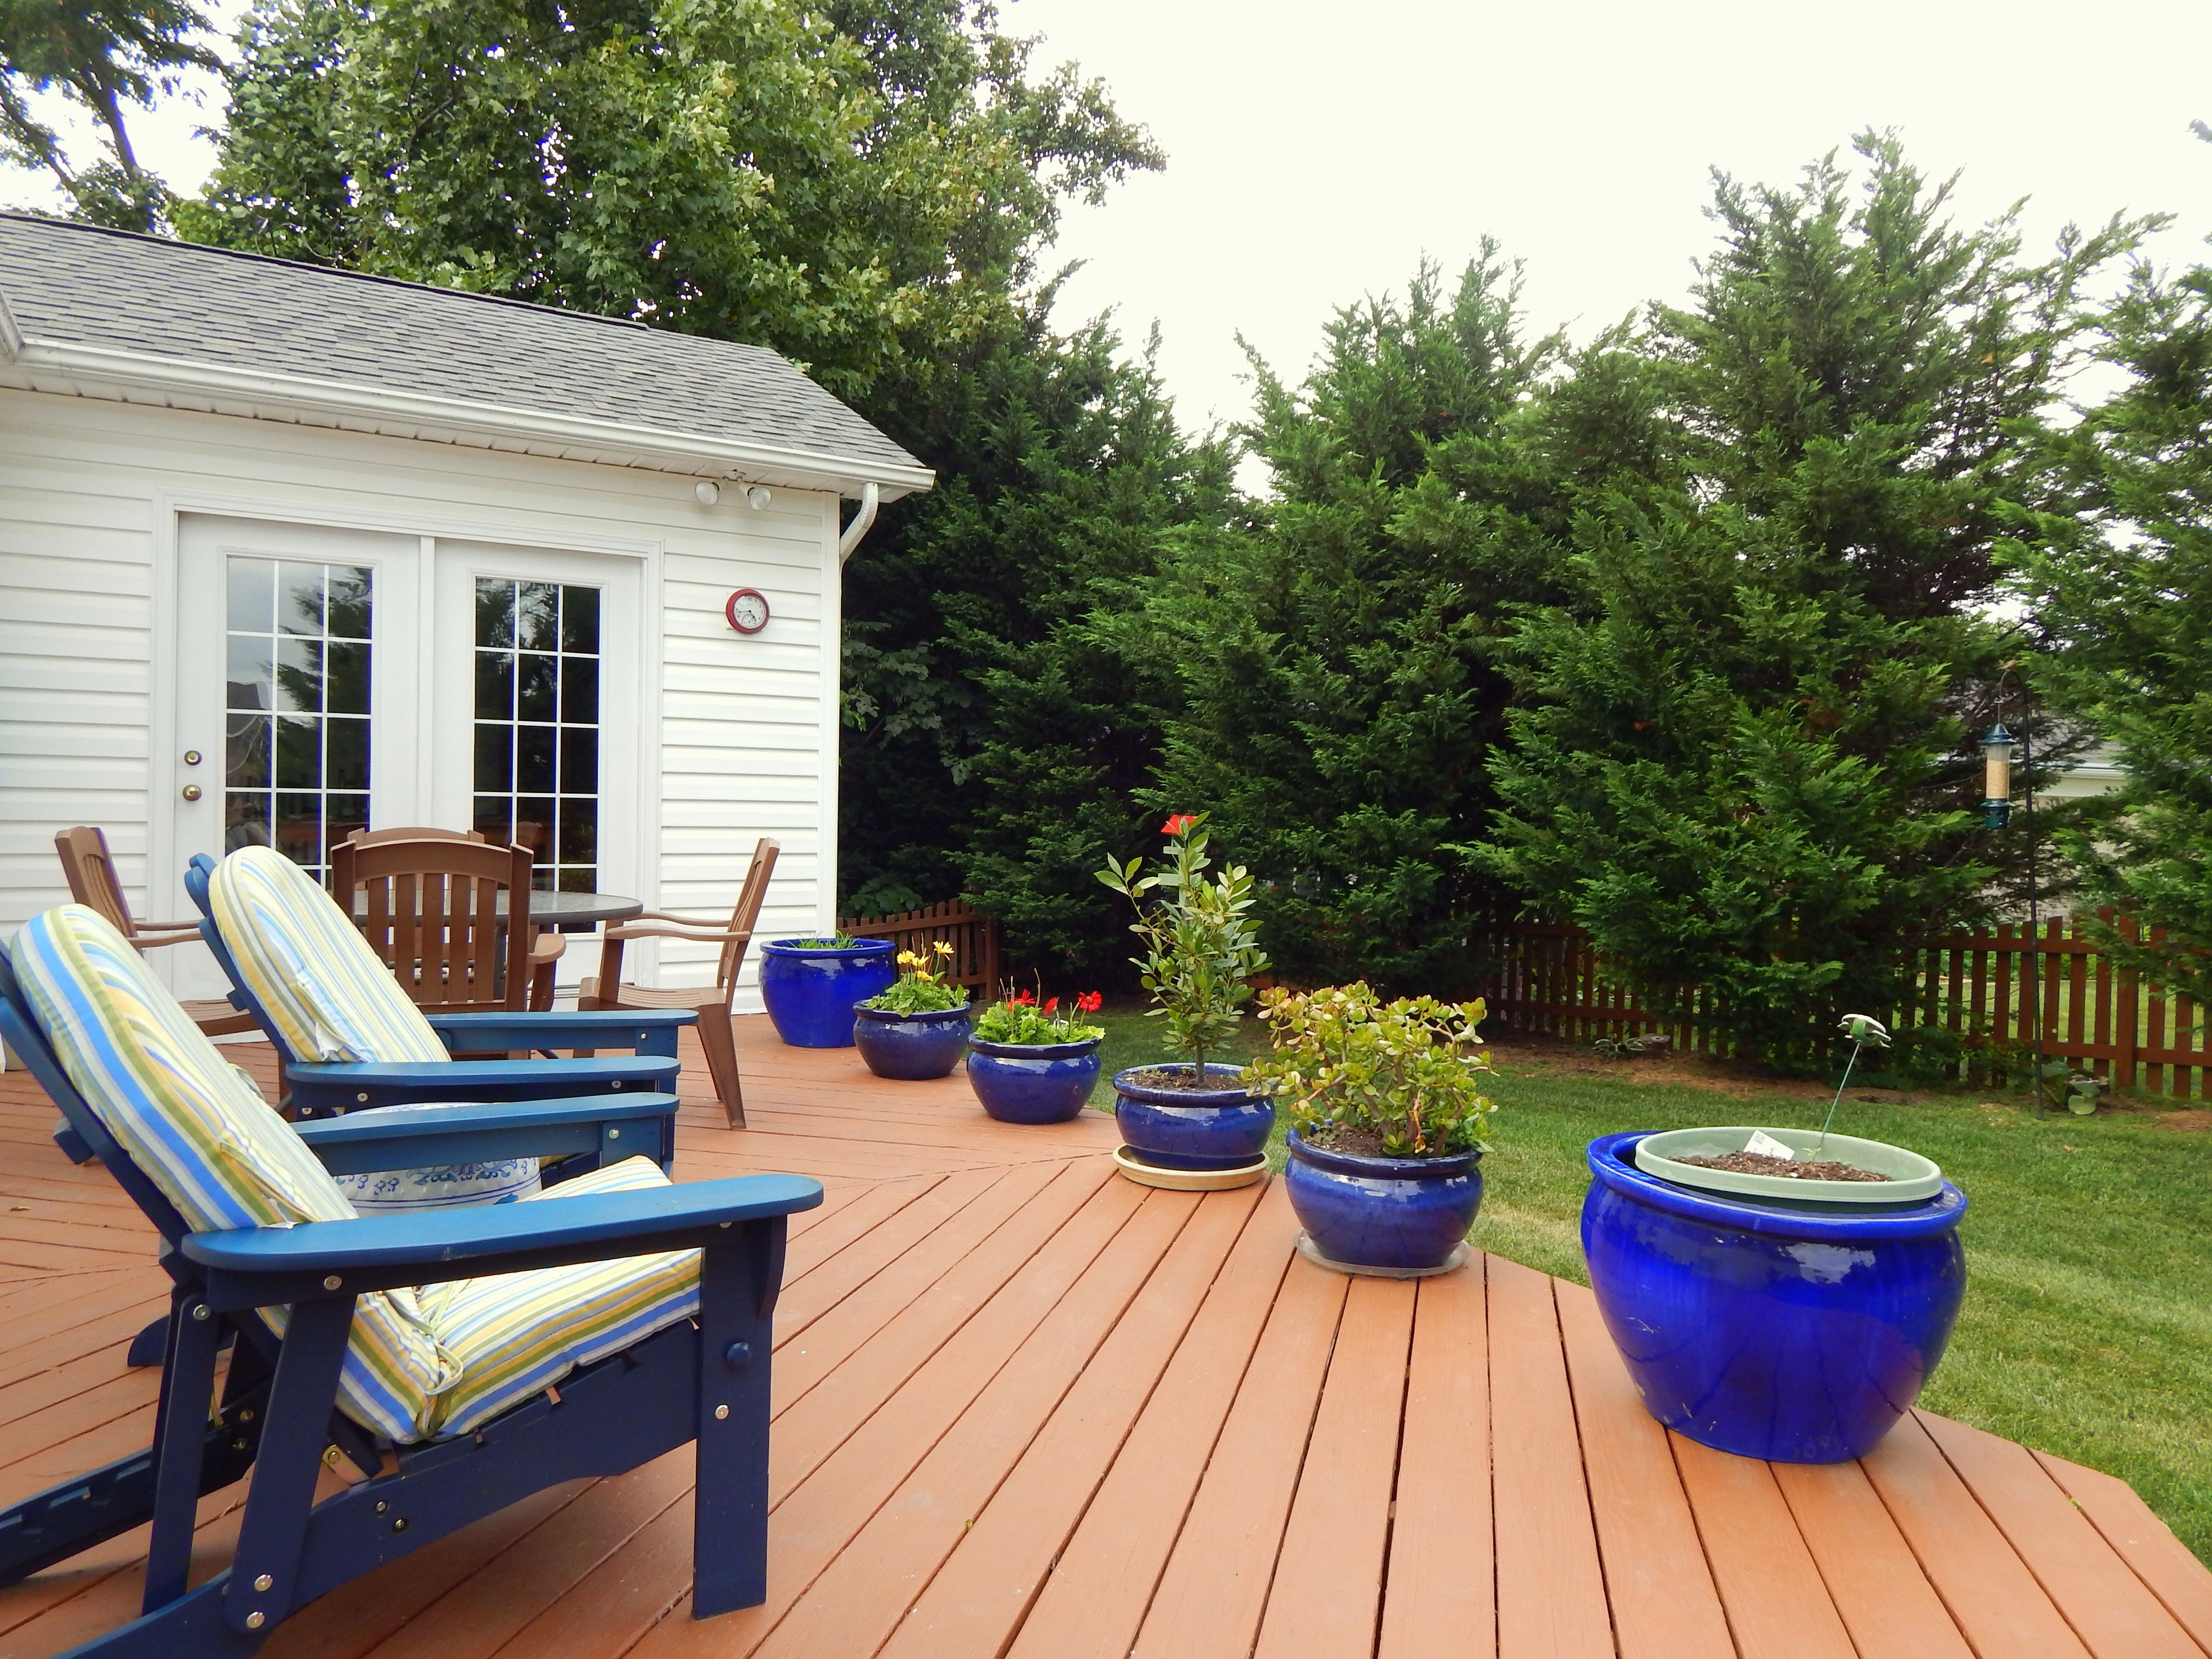 Team Daniels Front Royal Va Real Estate Team Amazing Homes For